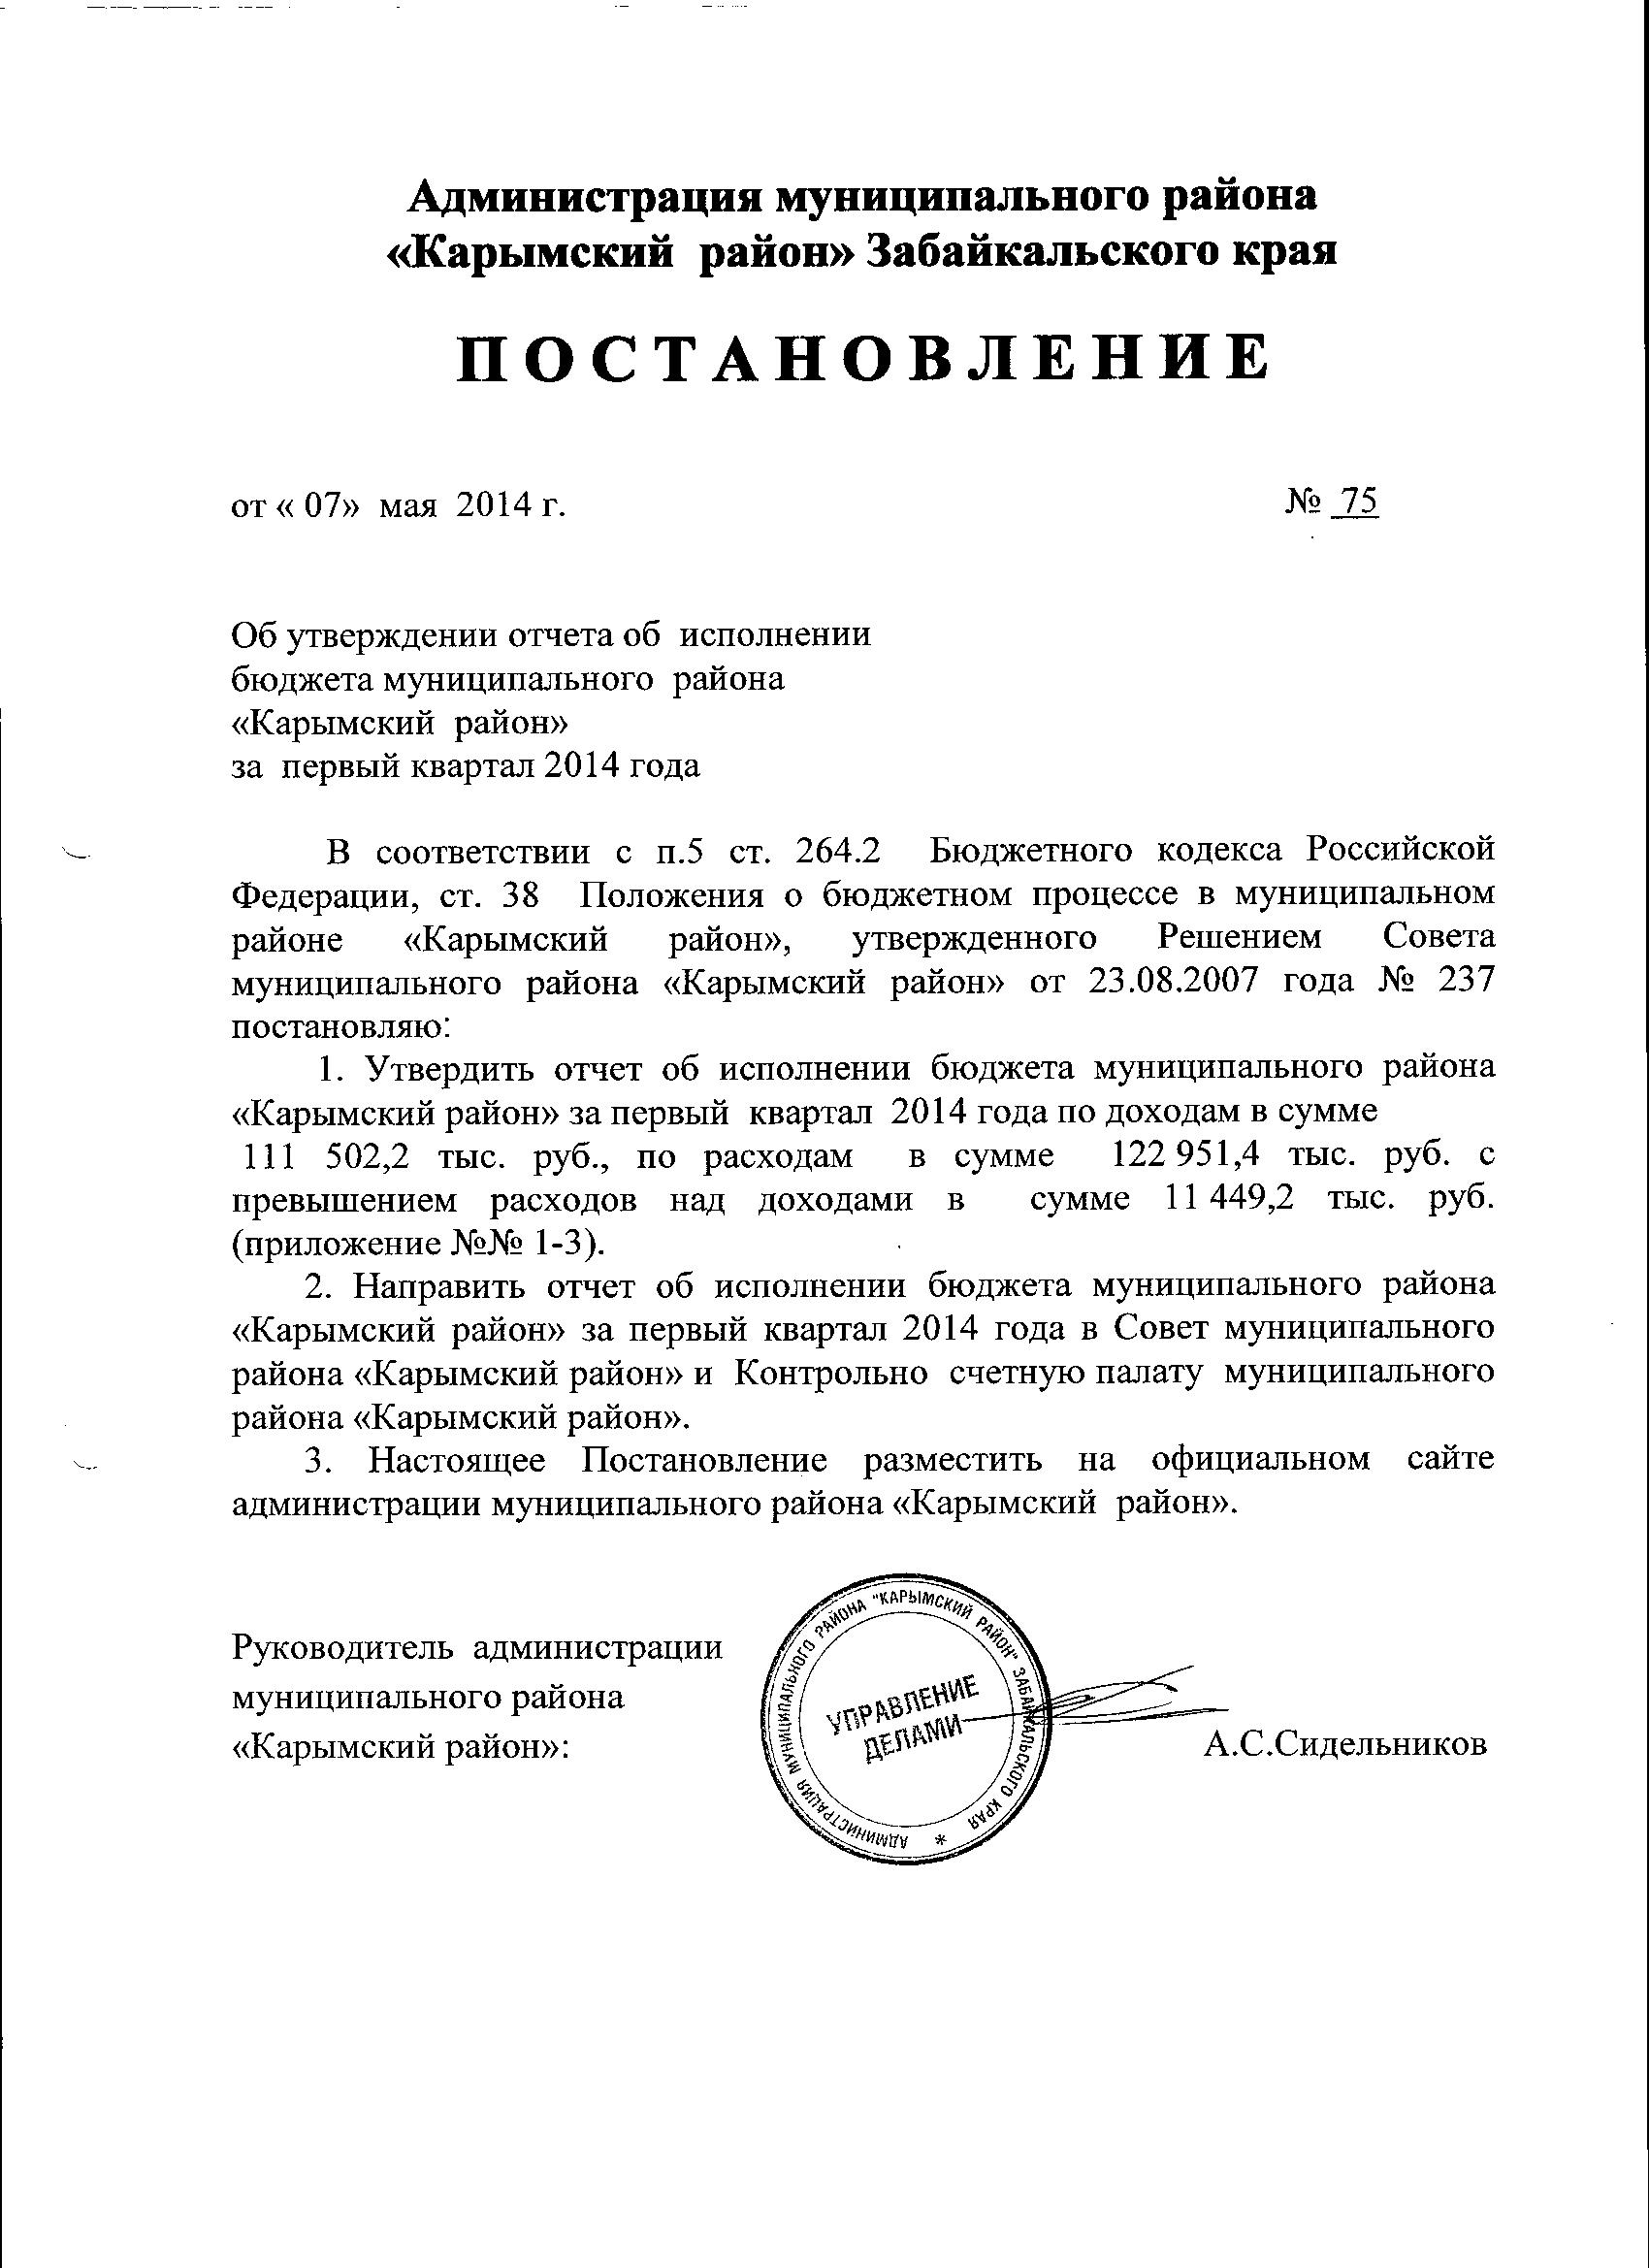 Постановление от 07.05.2014 №75